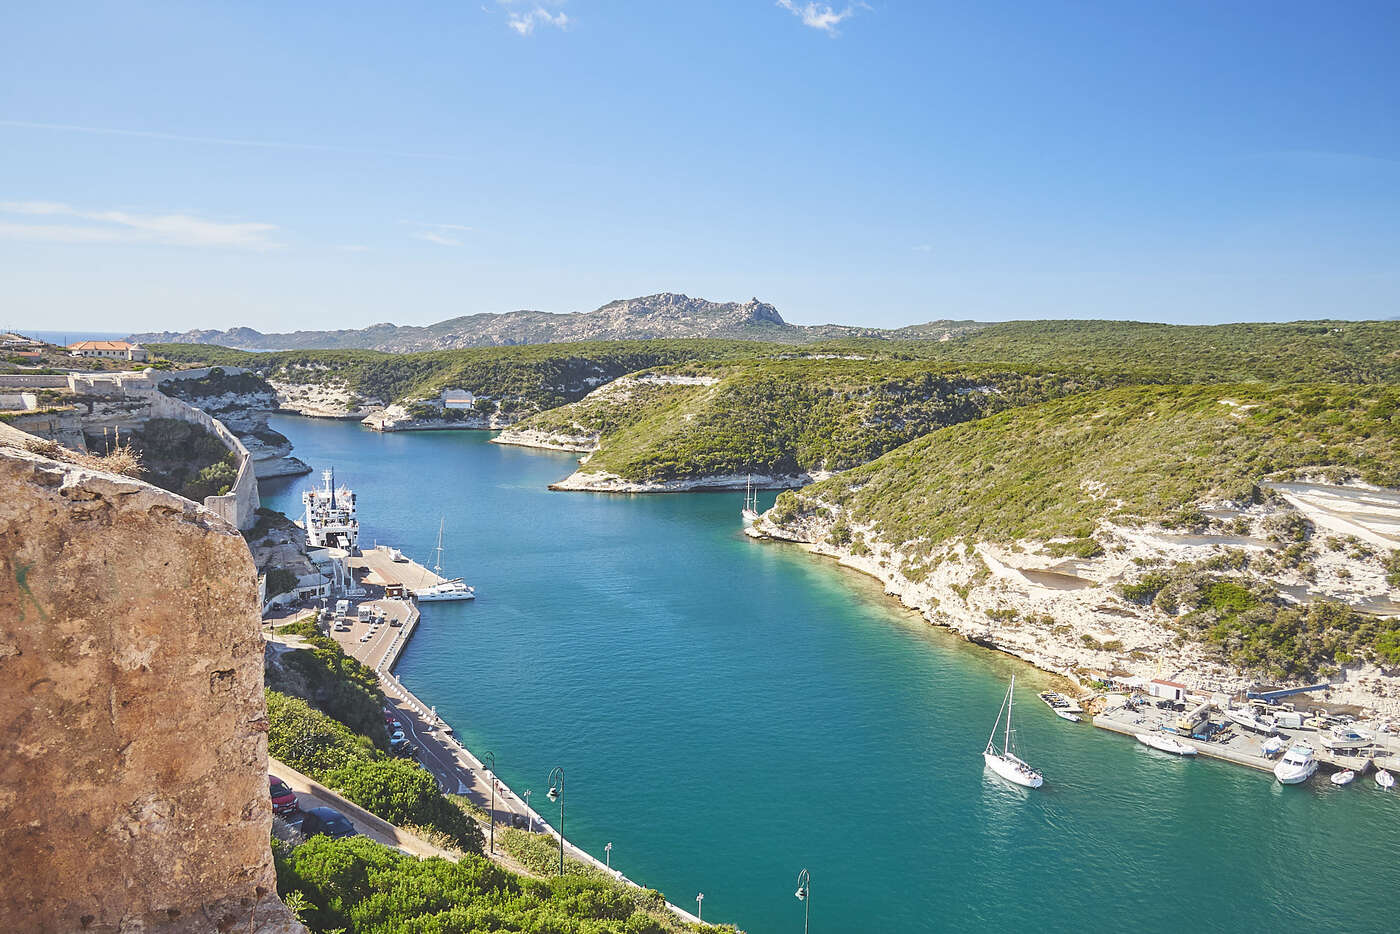 Canal du port de Bonifacio, Corse